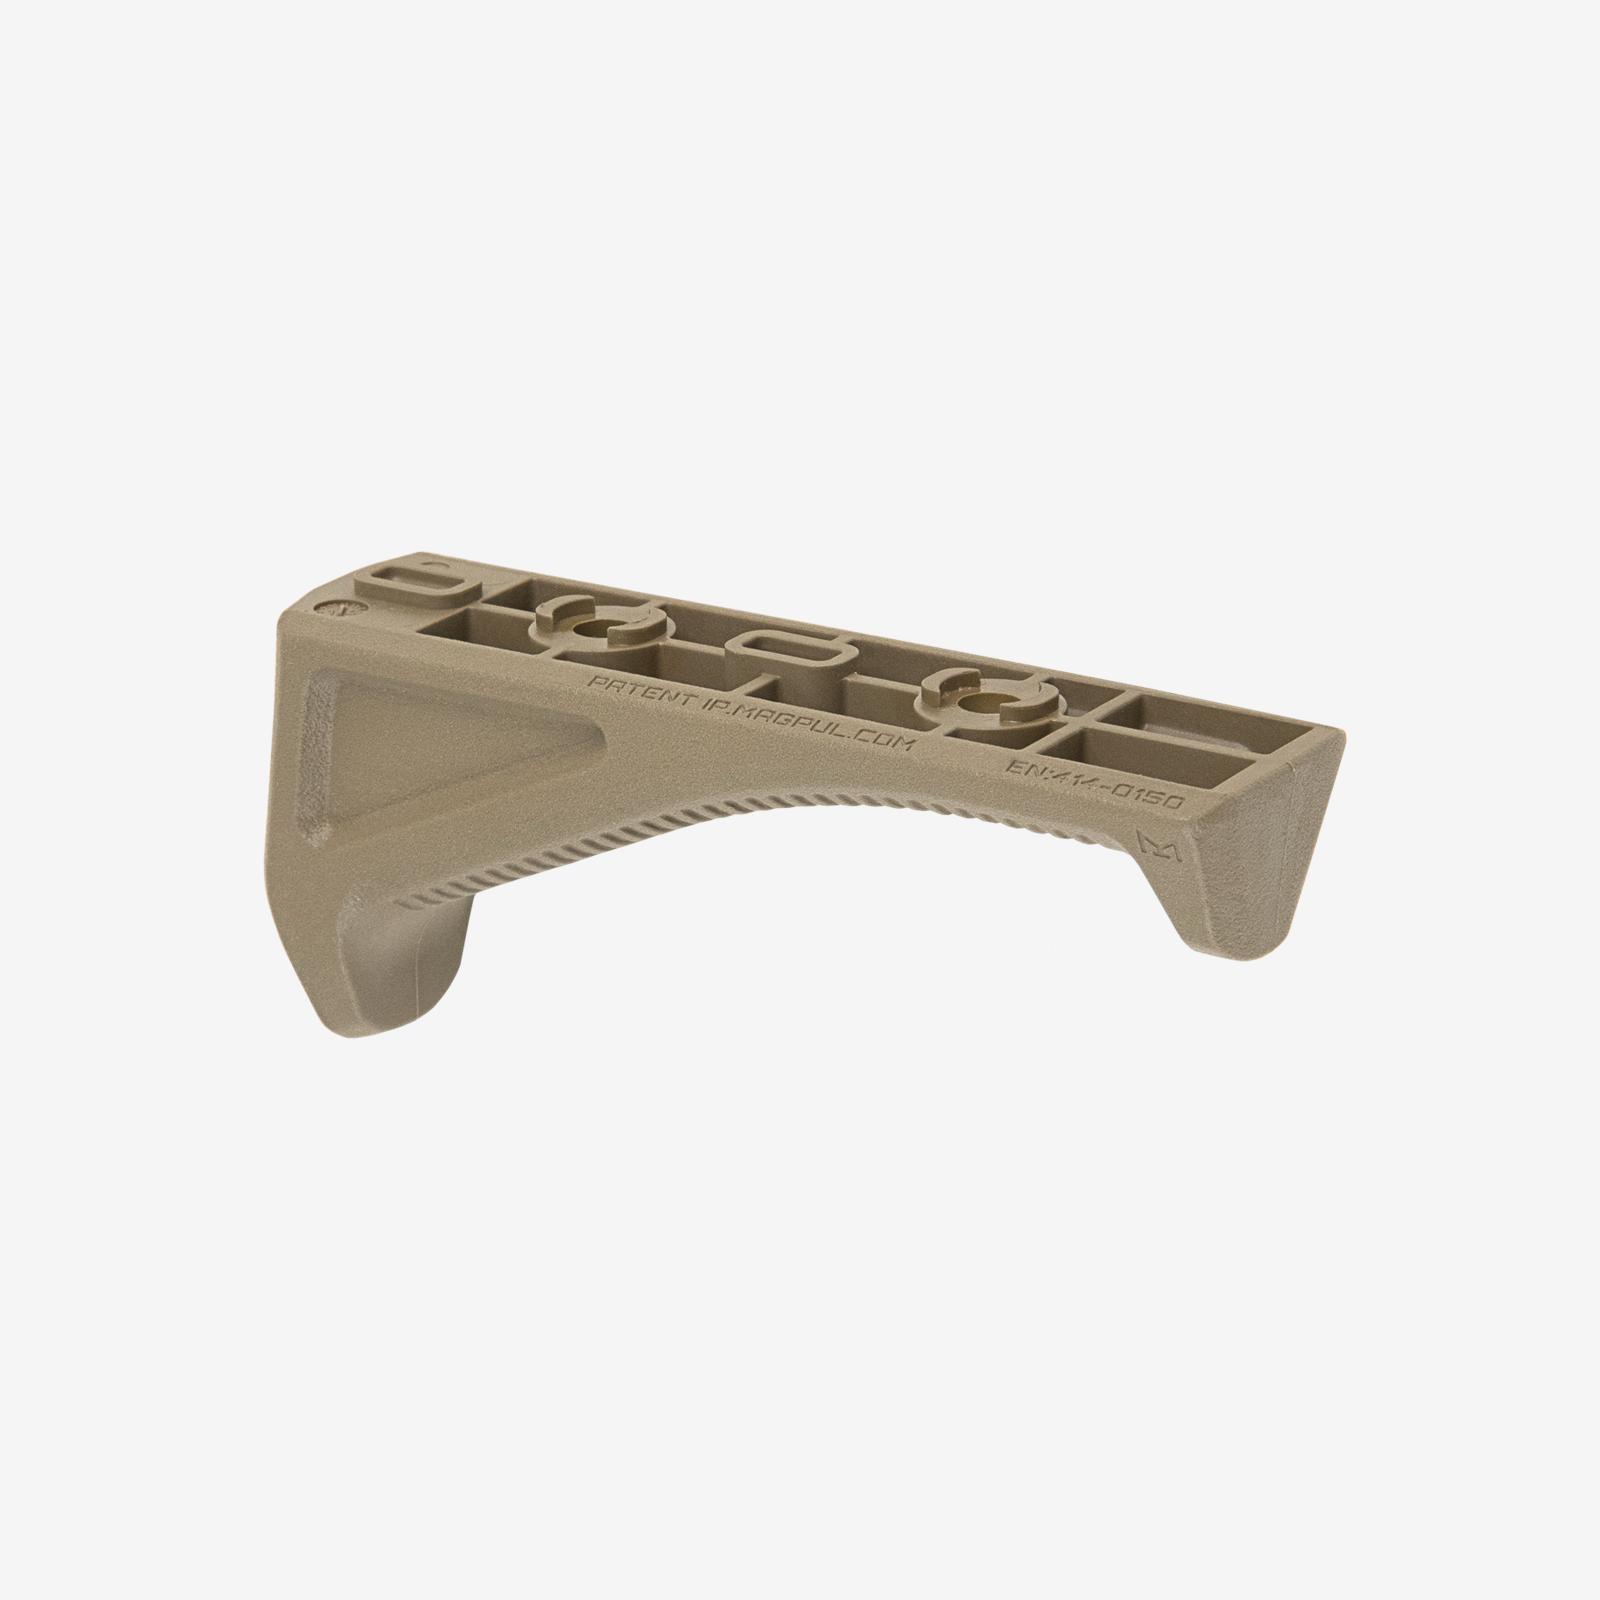 Рукоятка на цевье горизонтальная MAGPUL  (система M-Lok) M-LOK™AFG®AngledFore-GripM